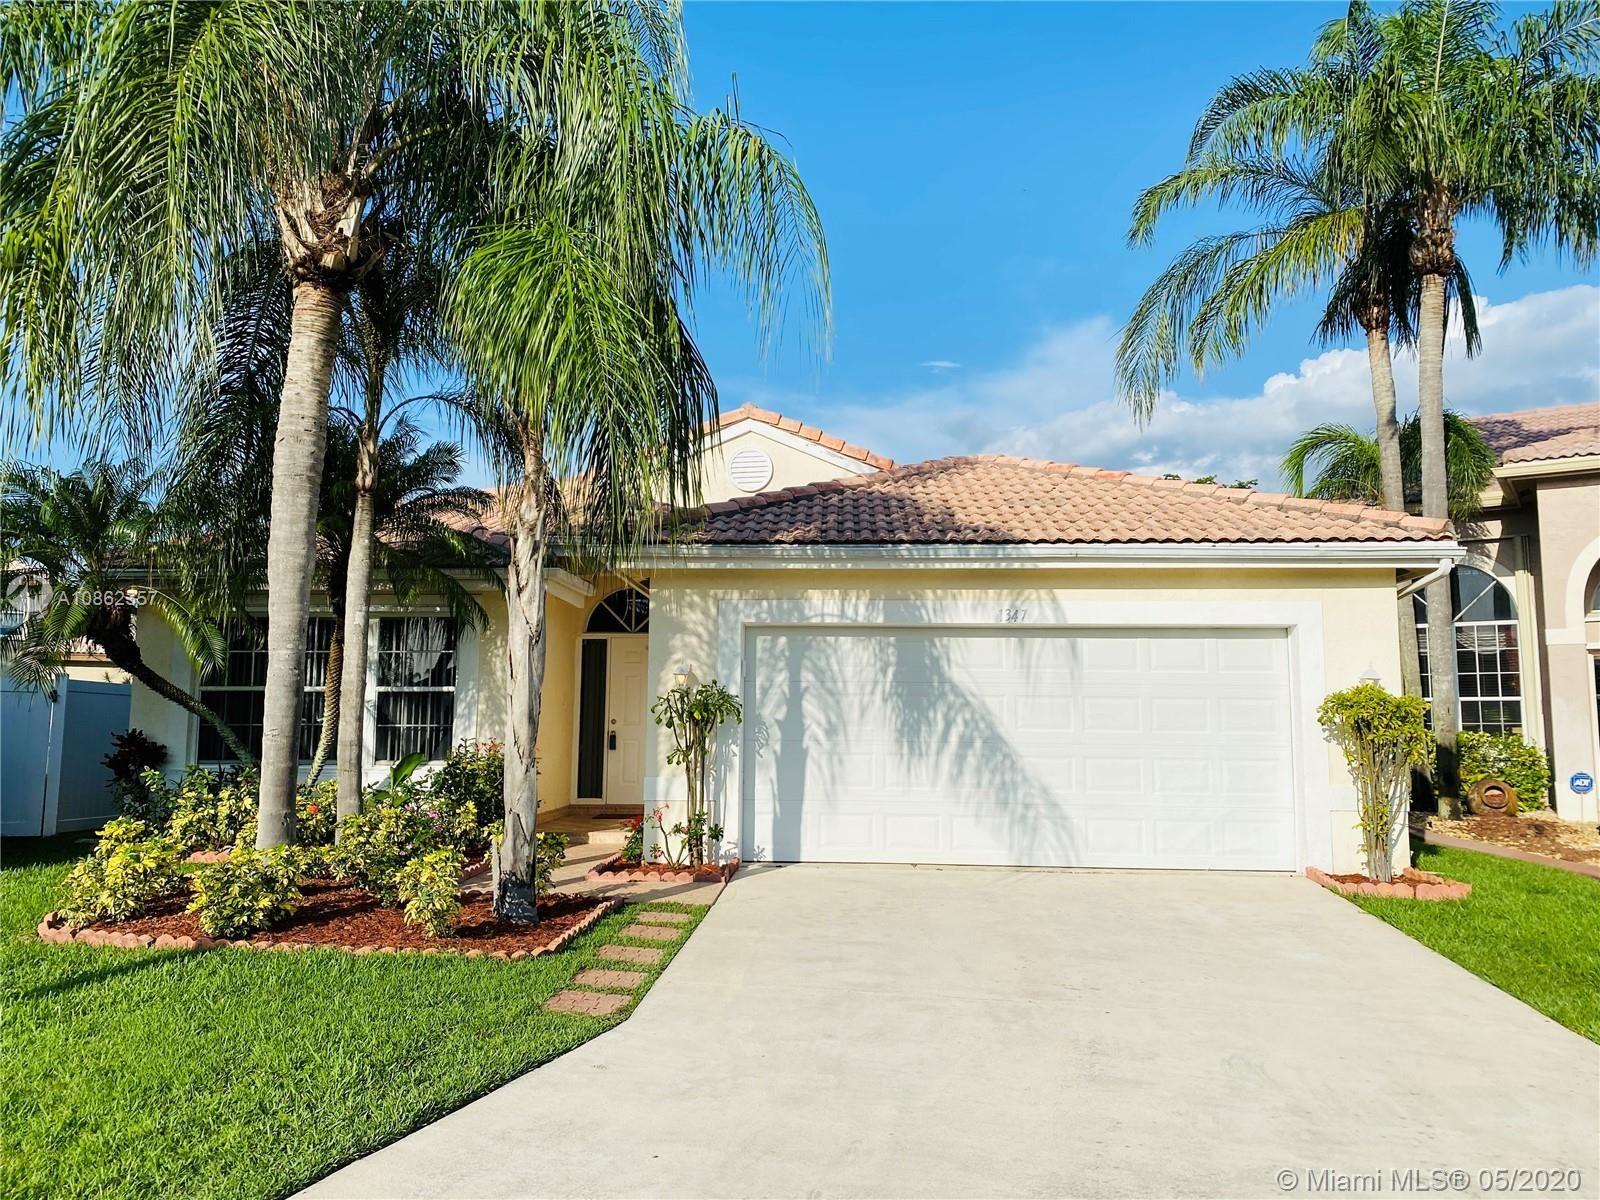 1347 SW 181st Ave, Pembroke Pines, FL 33029 - #: A10862357